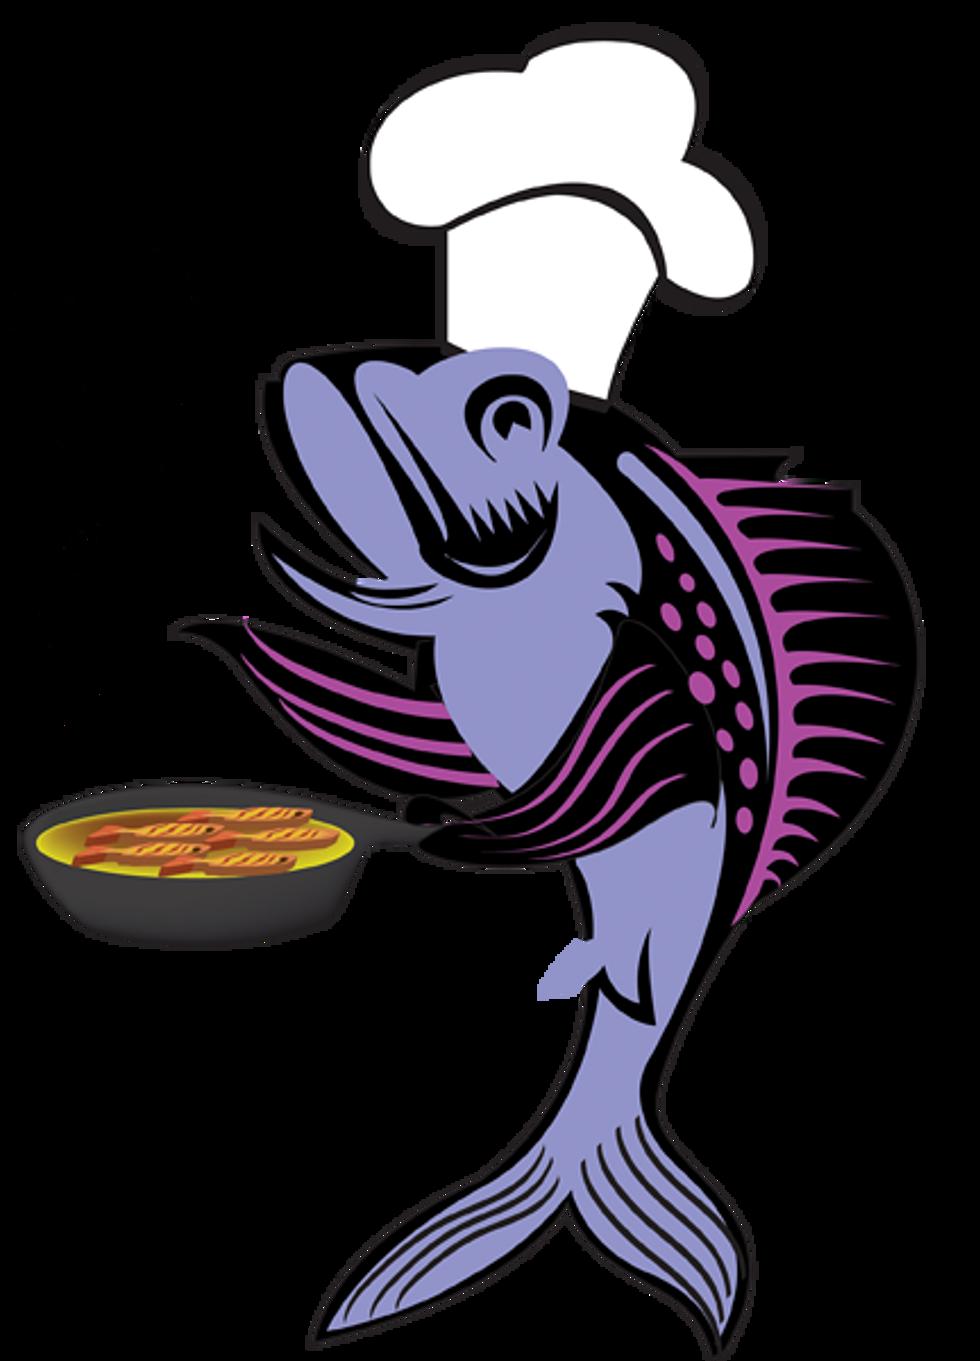 Foods clipart fry. Smithton community fish